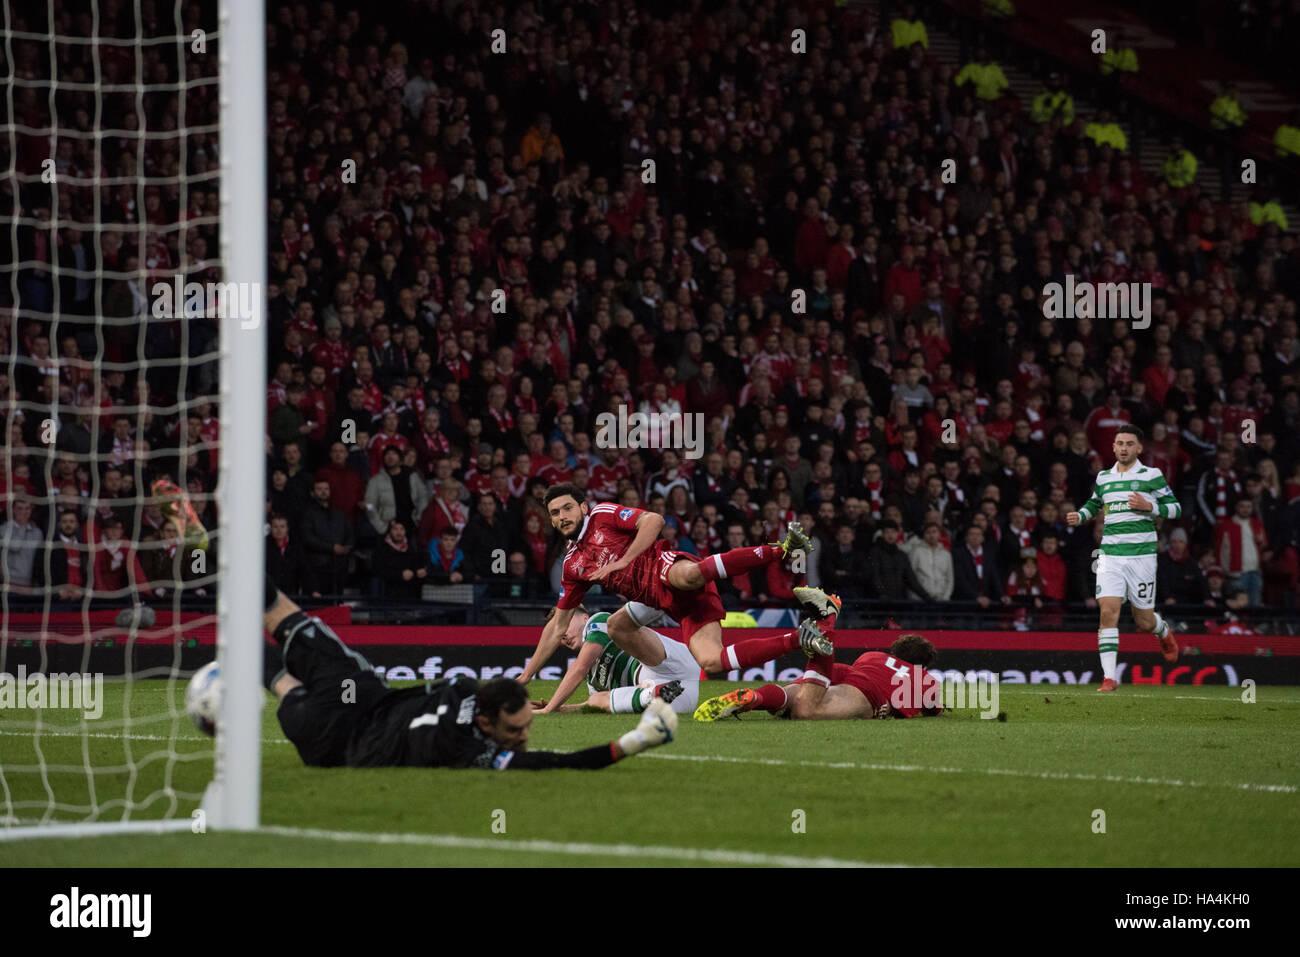 Aberdeen v Celtic, Betrfred League Cup Final, Glasgow, UK. 27th Nov, 2016.  James Forrest scores for Celtic Credit: - Stock Image